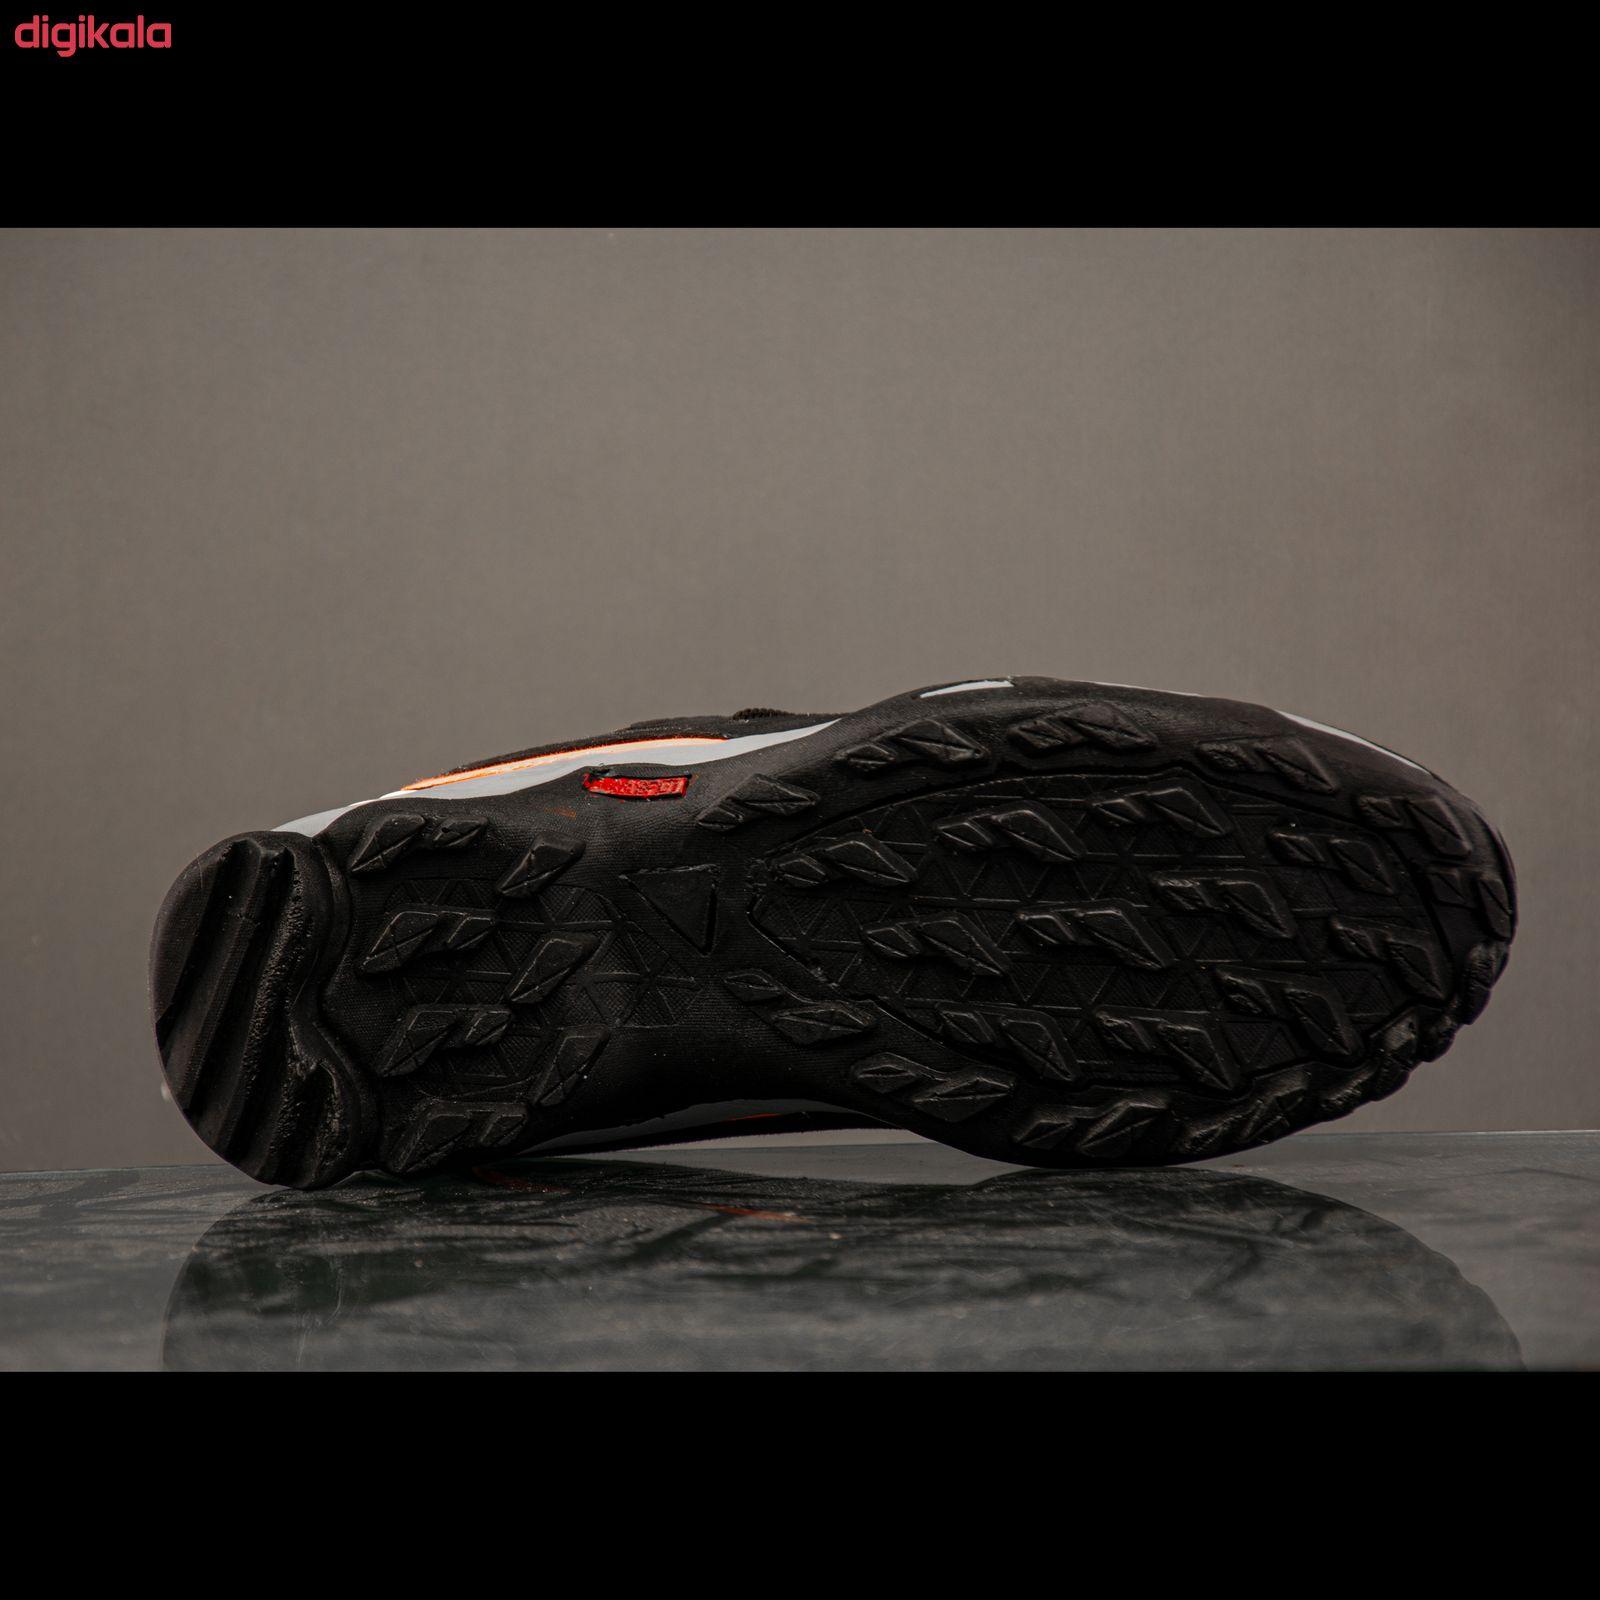 کفش کوهنوردی مردانه سارزی مدل hilas_M.e.s,Na.r.n.j_01 main 1 3